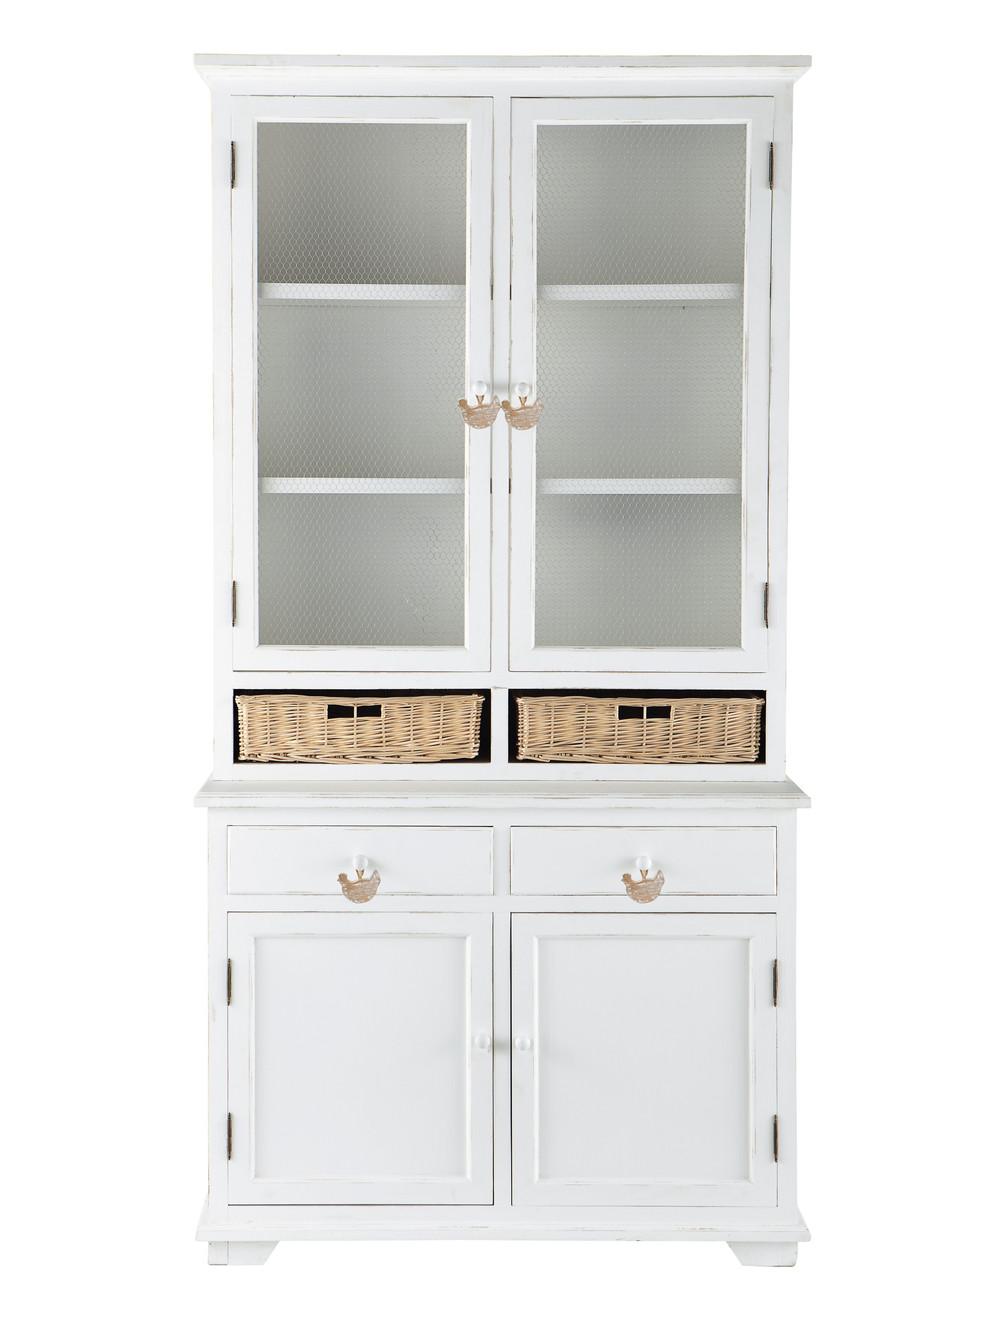 Piattaia bianca in legno di paulonia l 110 cm basse cour for Paulownia legno mobili